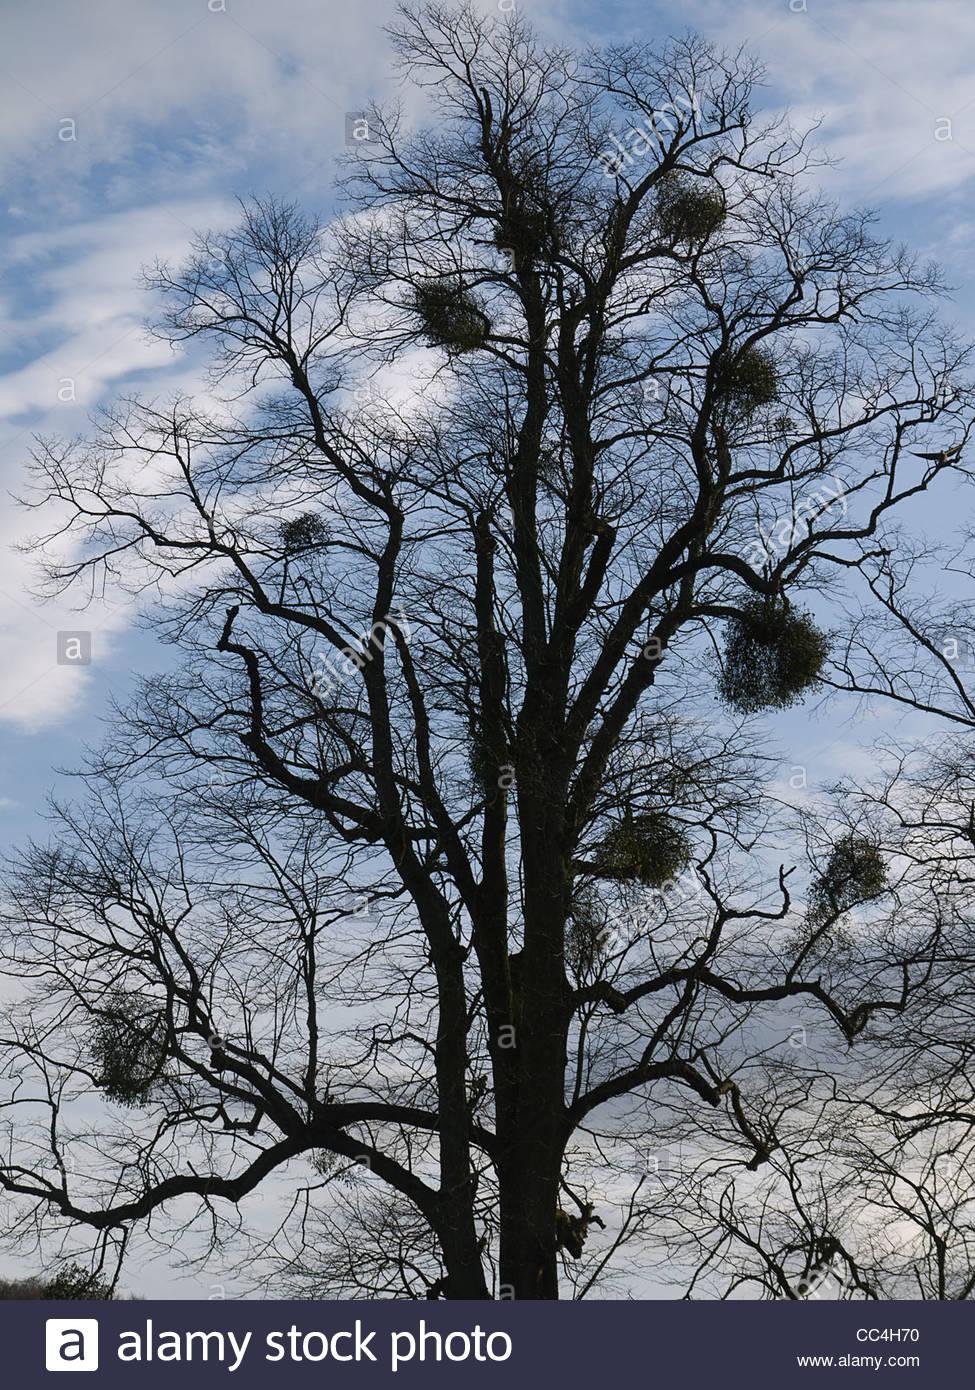 European mistletoe attached to Host Tree Silhouette - Stock Image